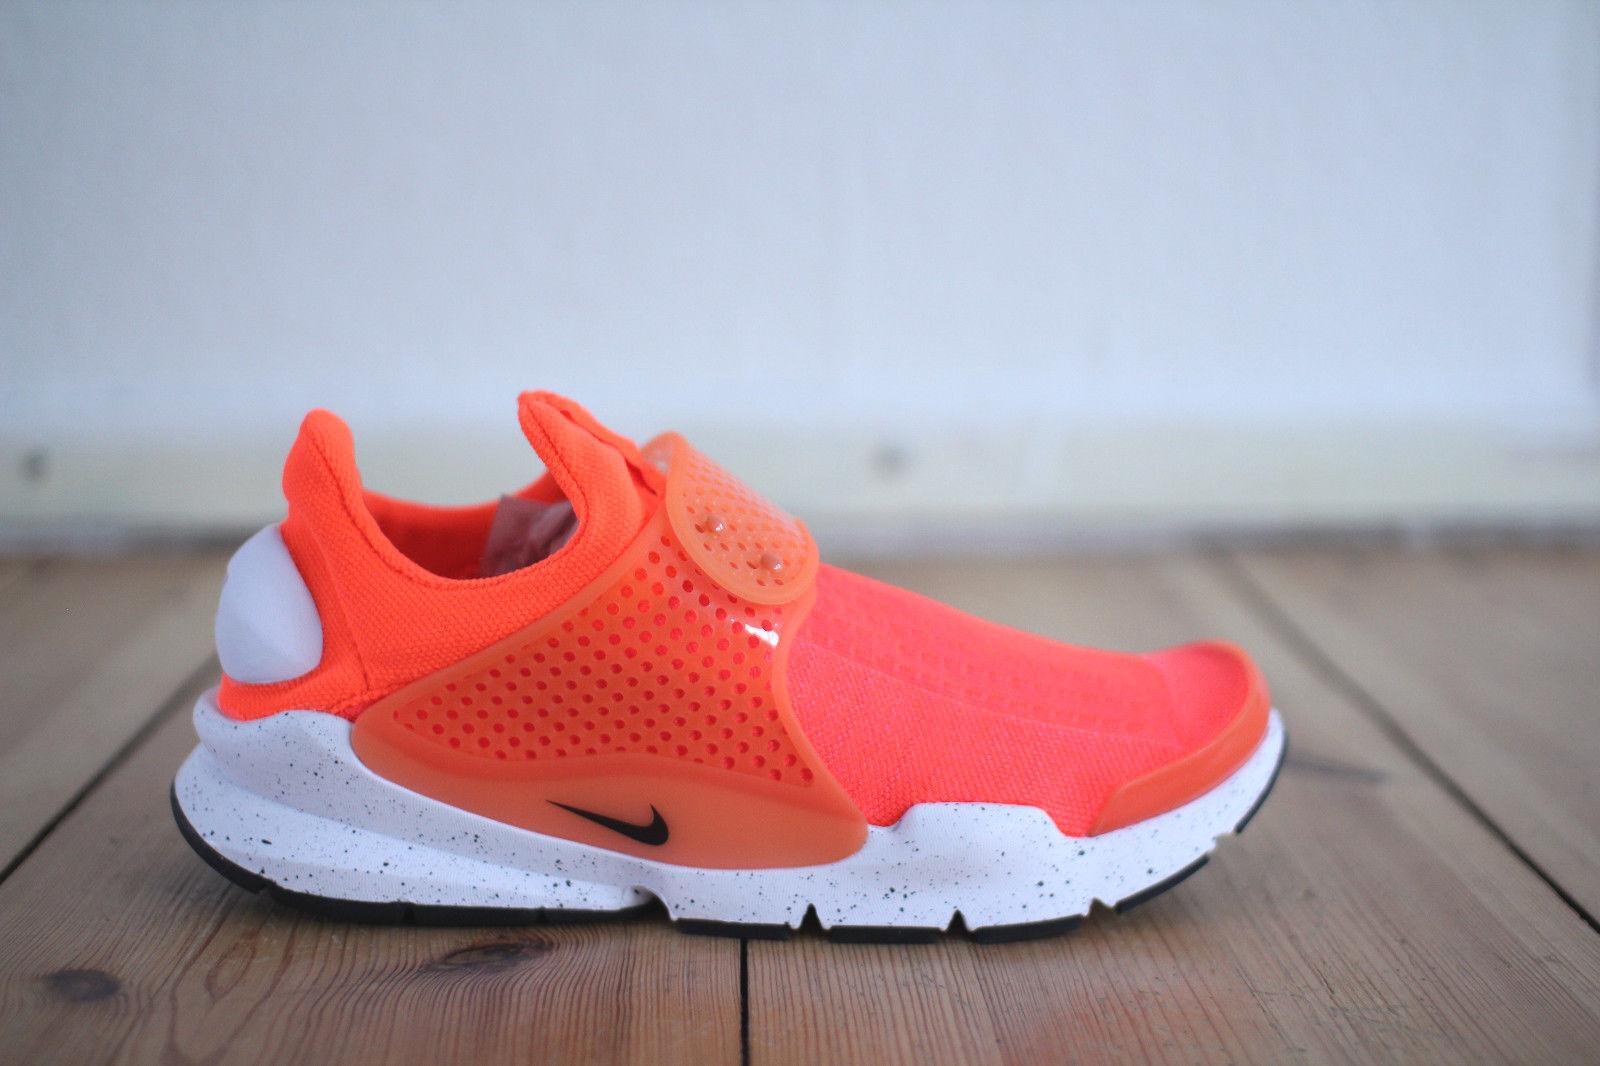 Nike Sock Dart SE Orange Oreo Gr. 40,41,44,46 NEU & OVP